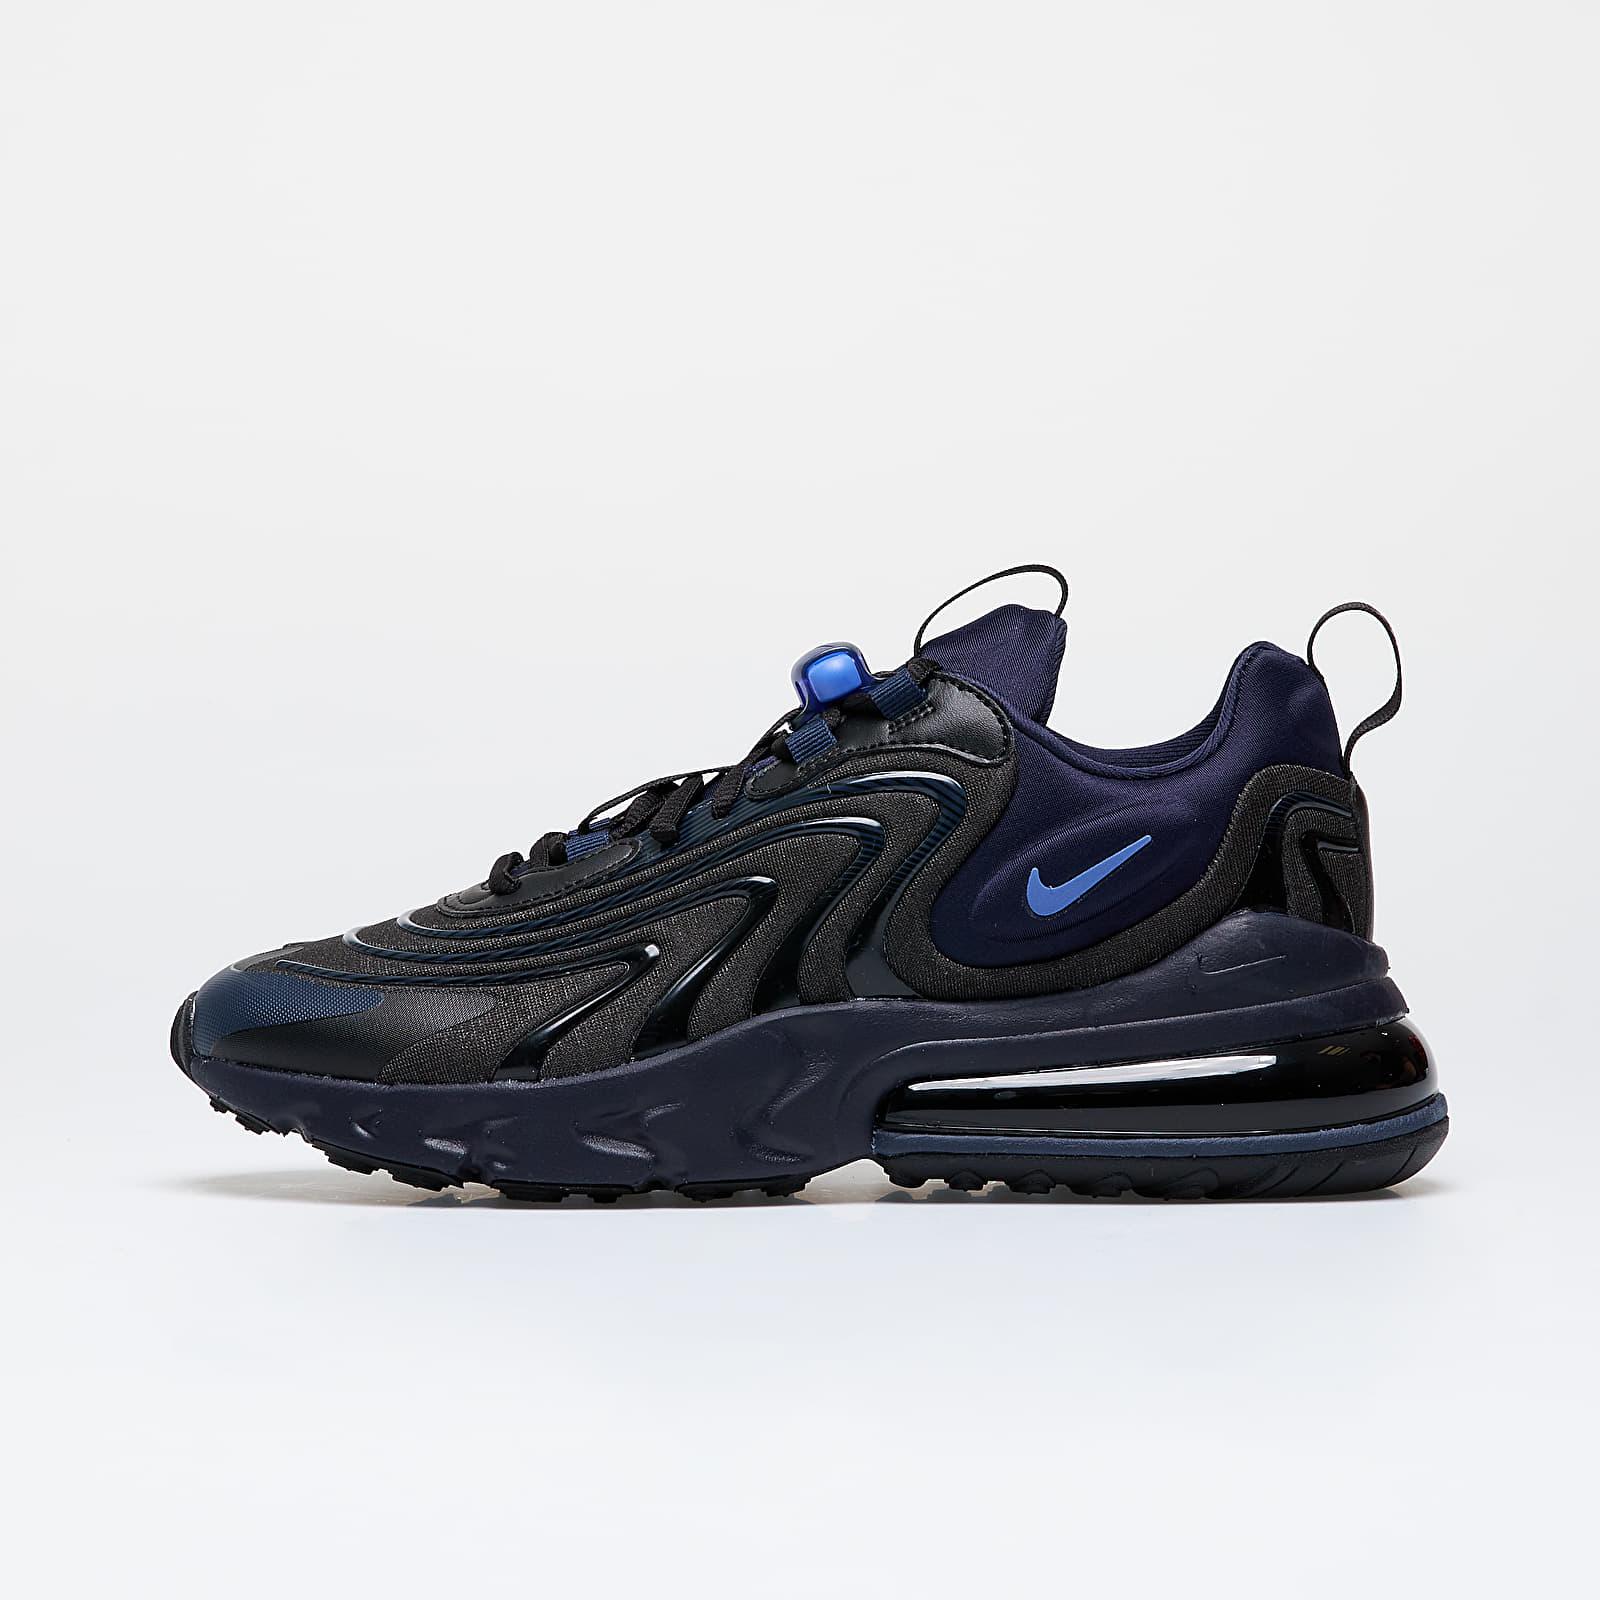 Men's shoes Nike Air Max 270 React ENG Black/ Sapphire-Obsidian